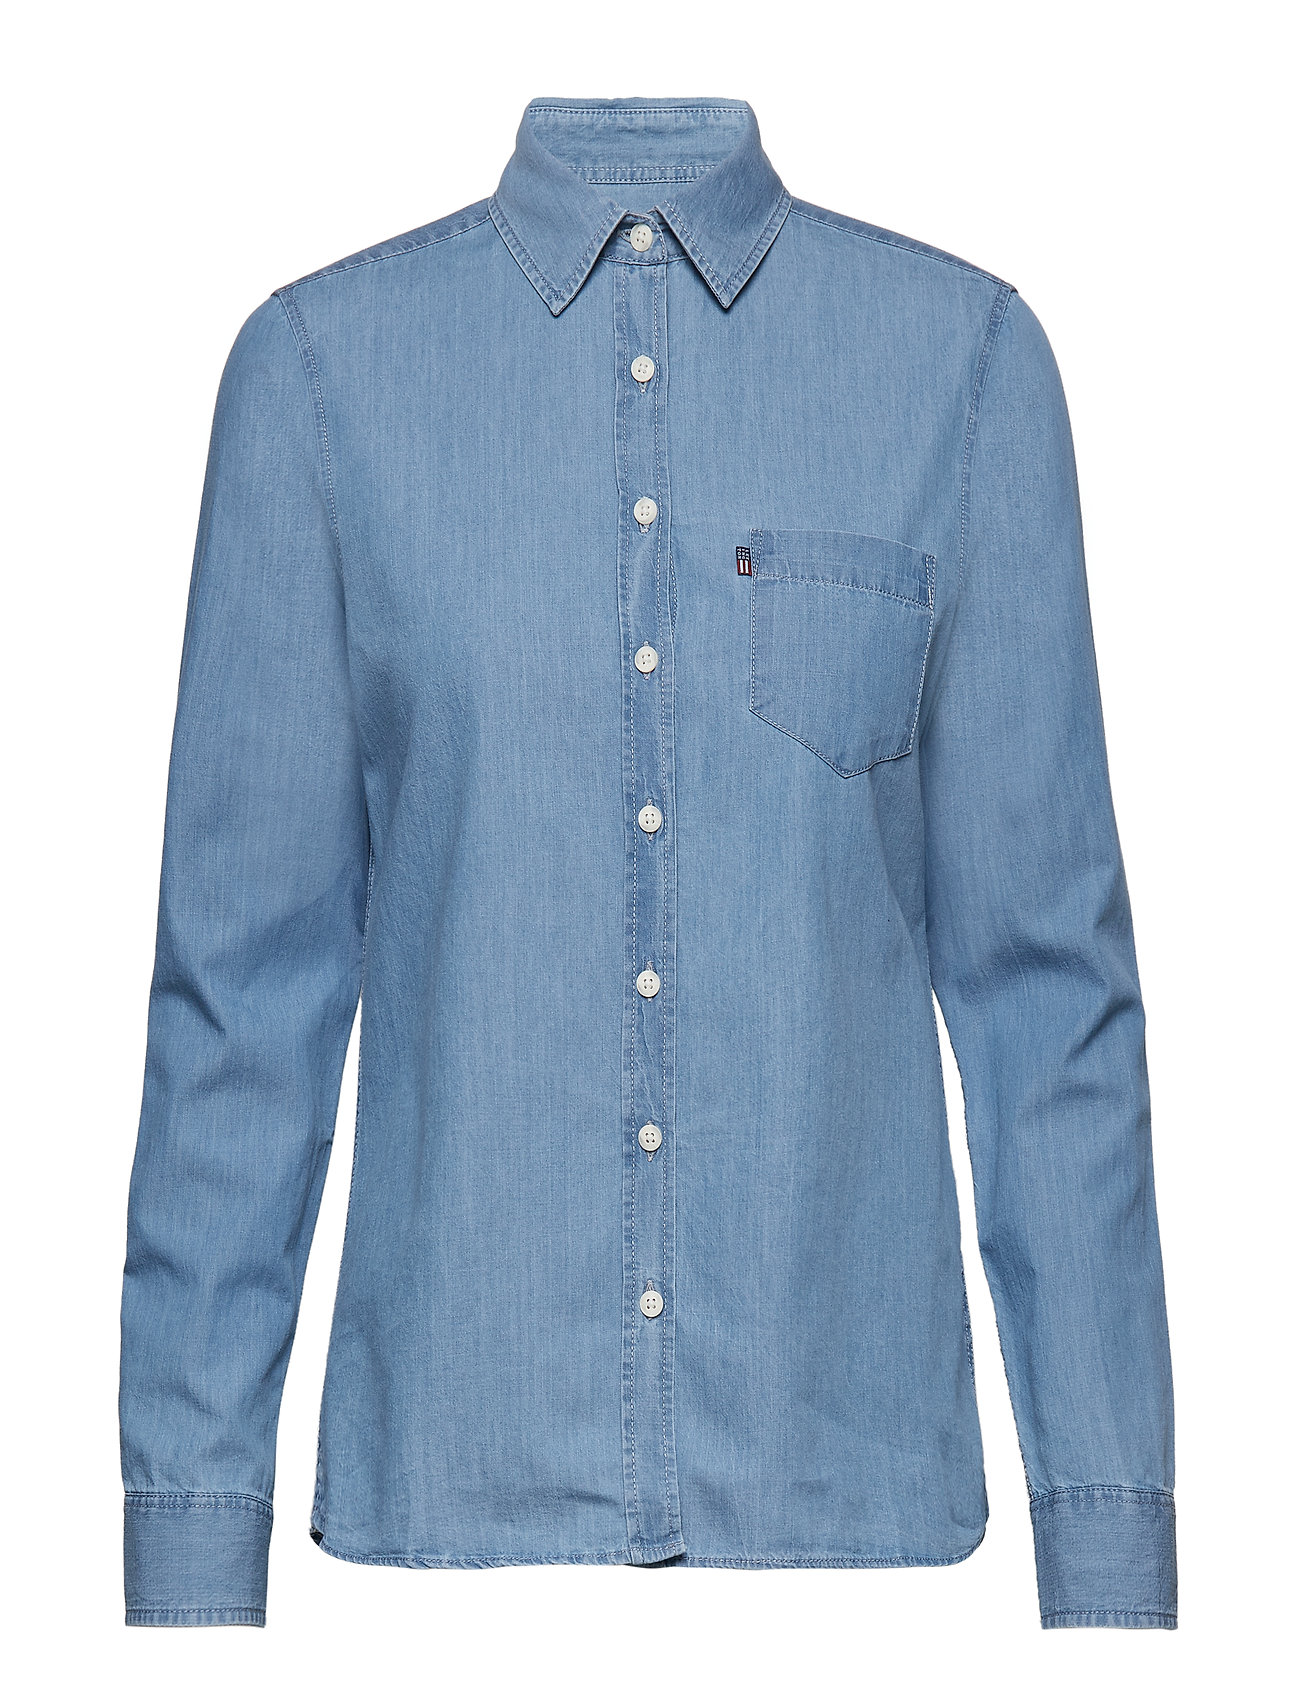 Lexington Clothing Emily Denim Shirt - LT BLUE DENIM